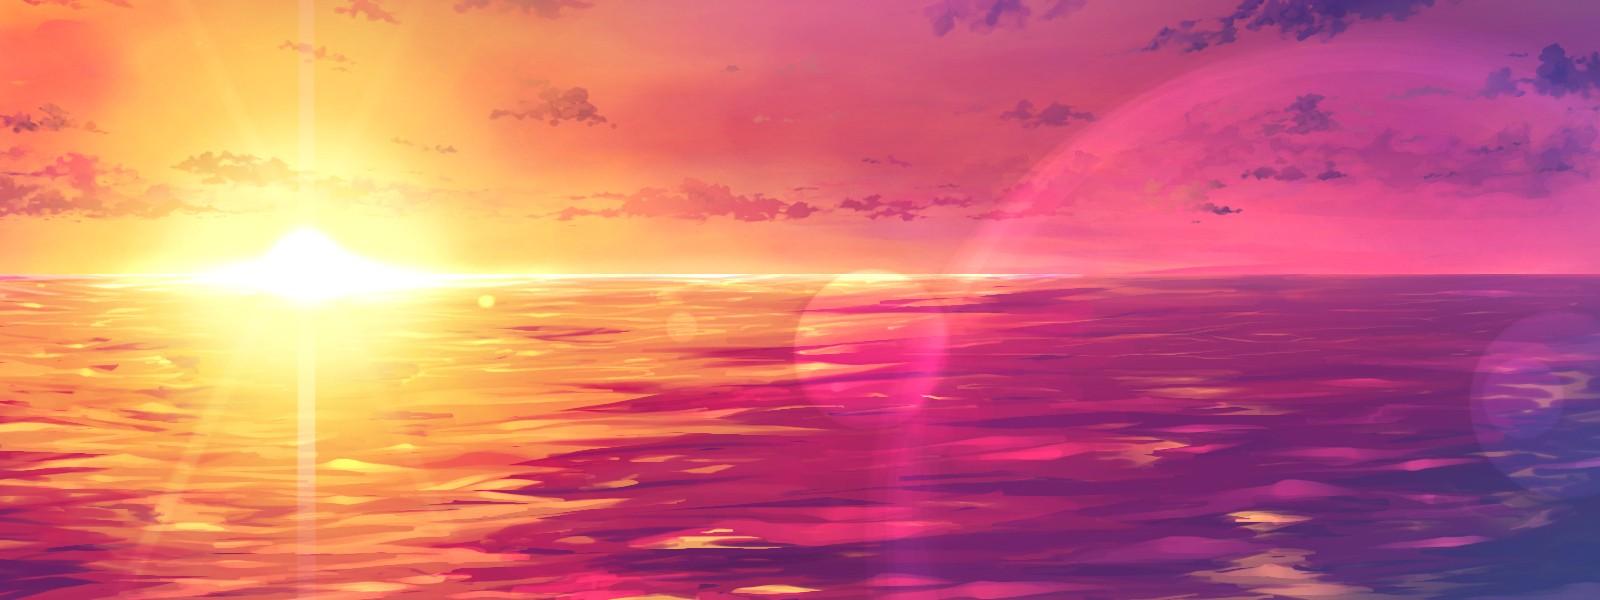 Pink Sunset 1600x600